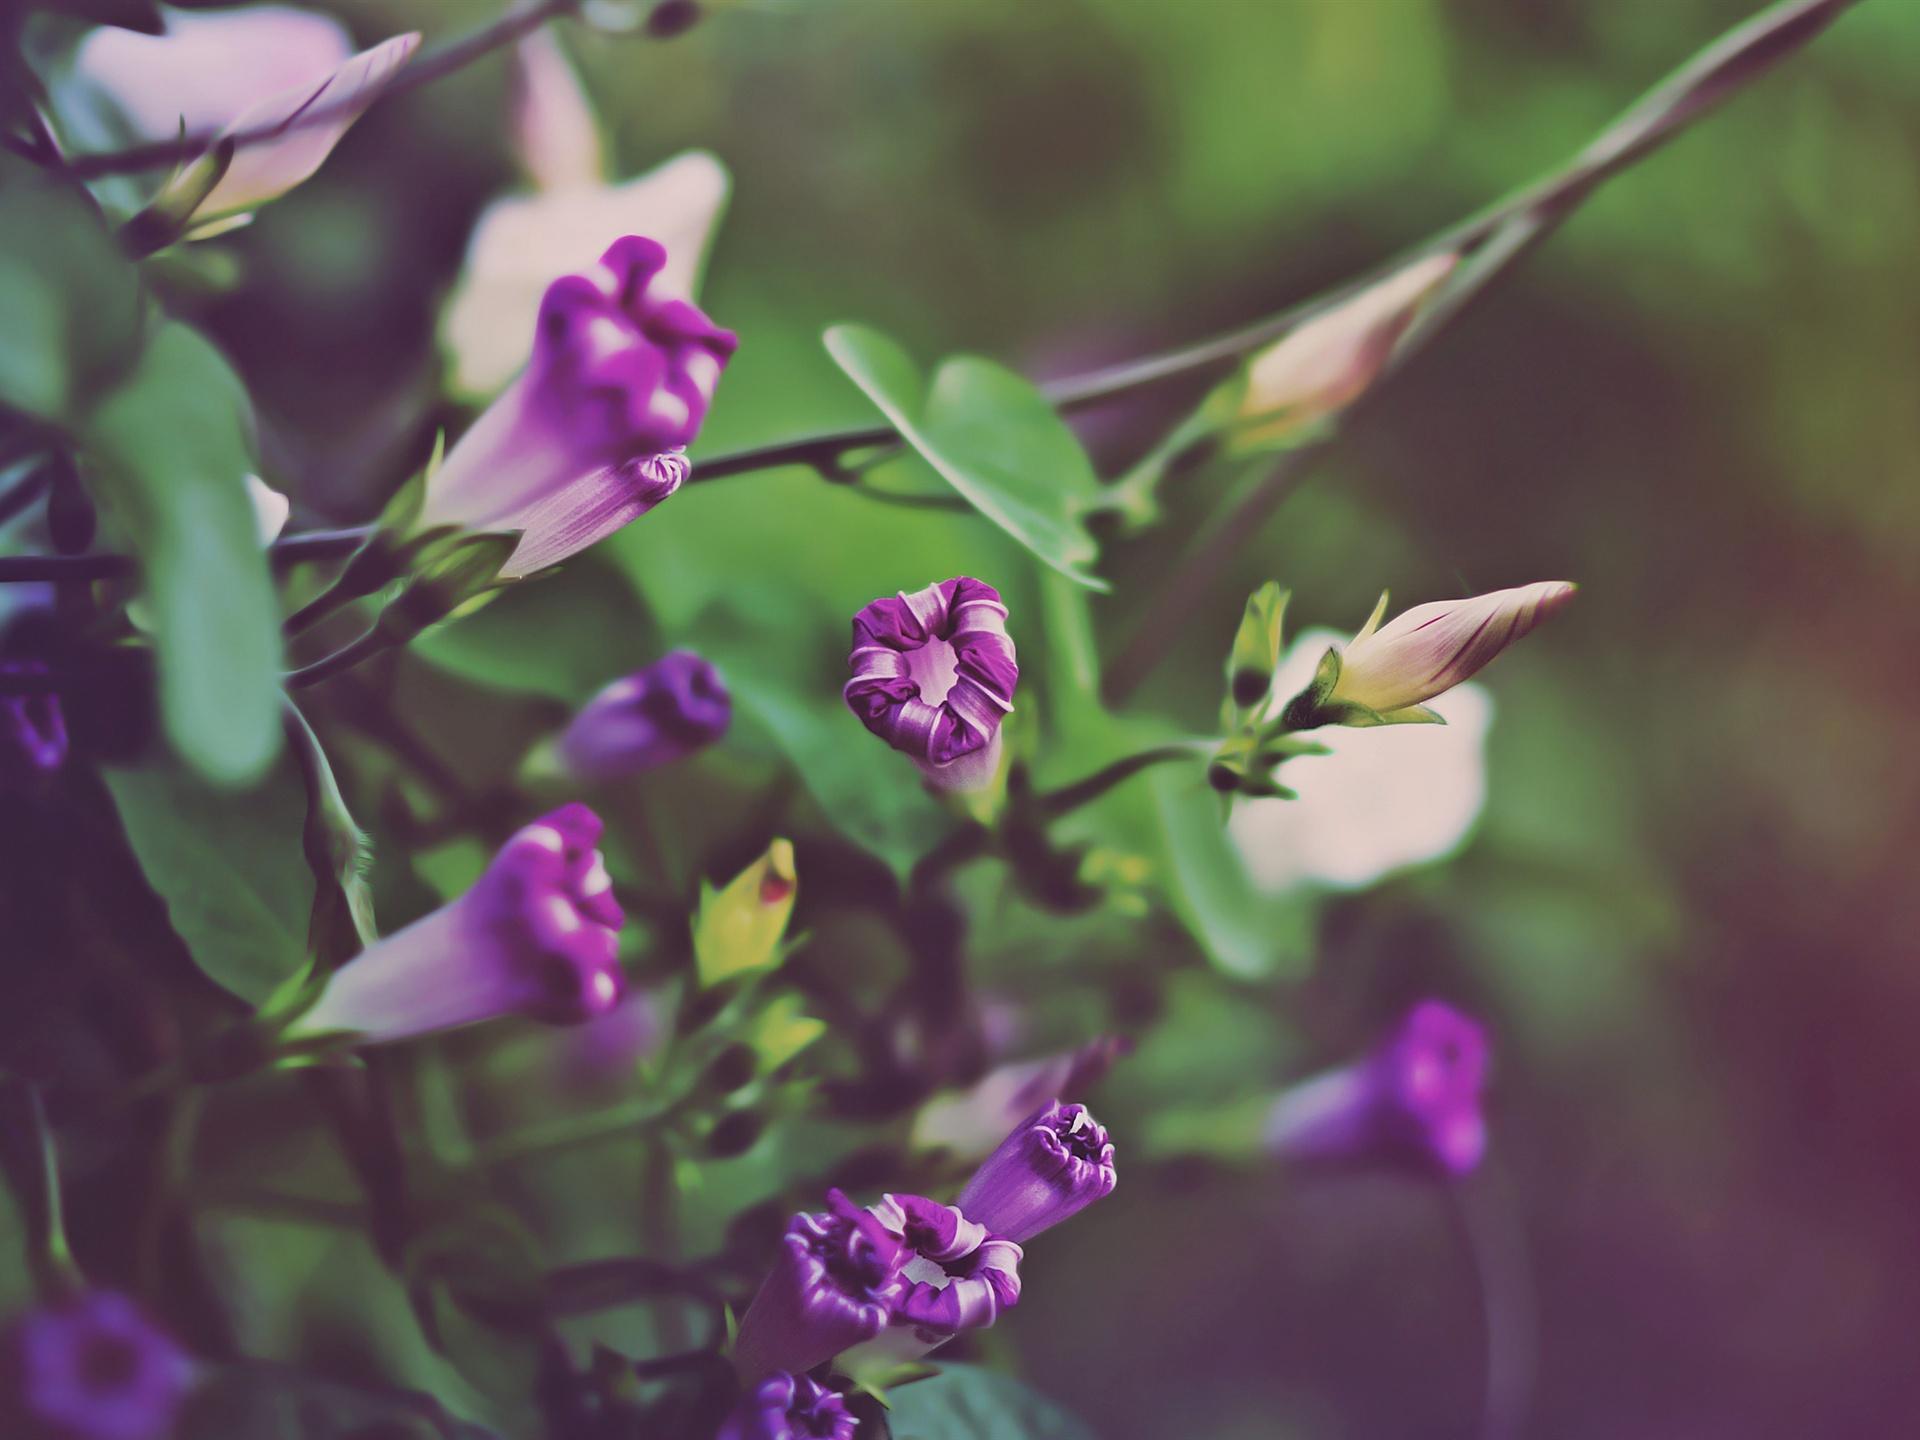 16 Luxury Pubg Wallpaper Iphone 6: 壁紙 朝顔の紫 2560x1600 HD 無料のデスクトップの背景, 画像